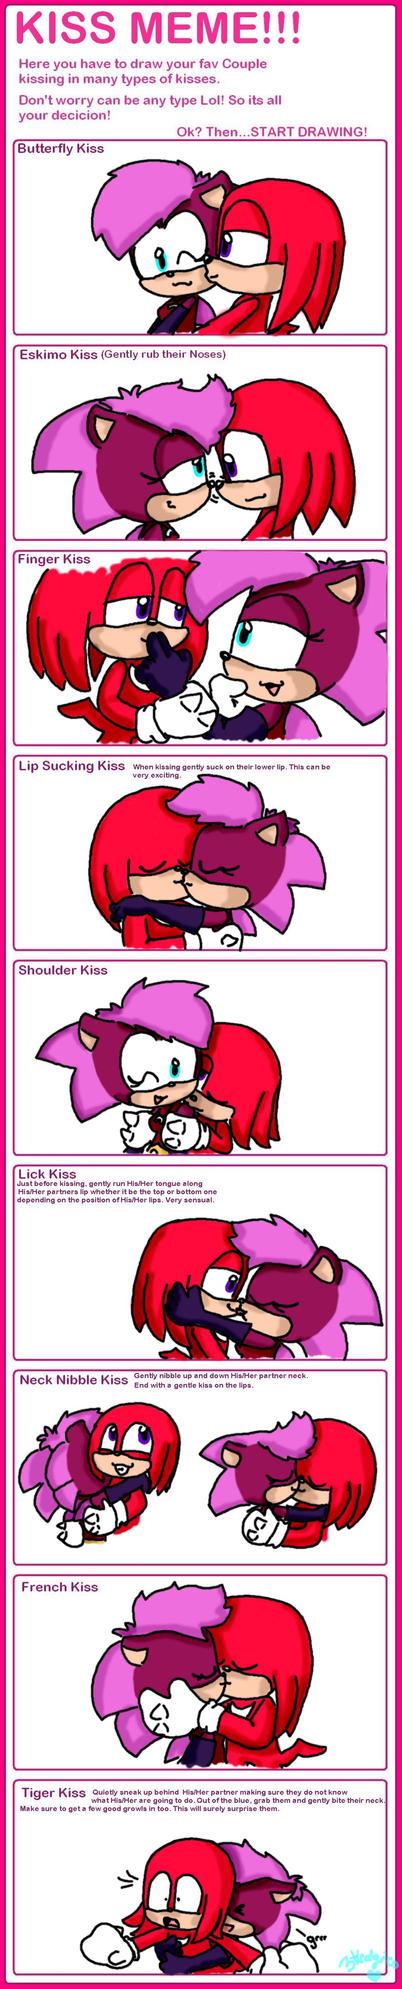 kiss meme Knuxiona by LeniProduction